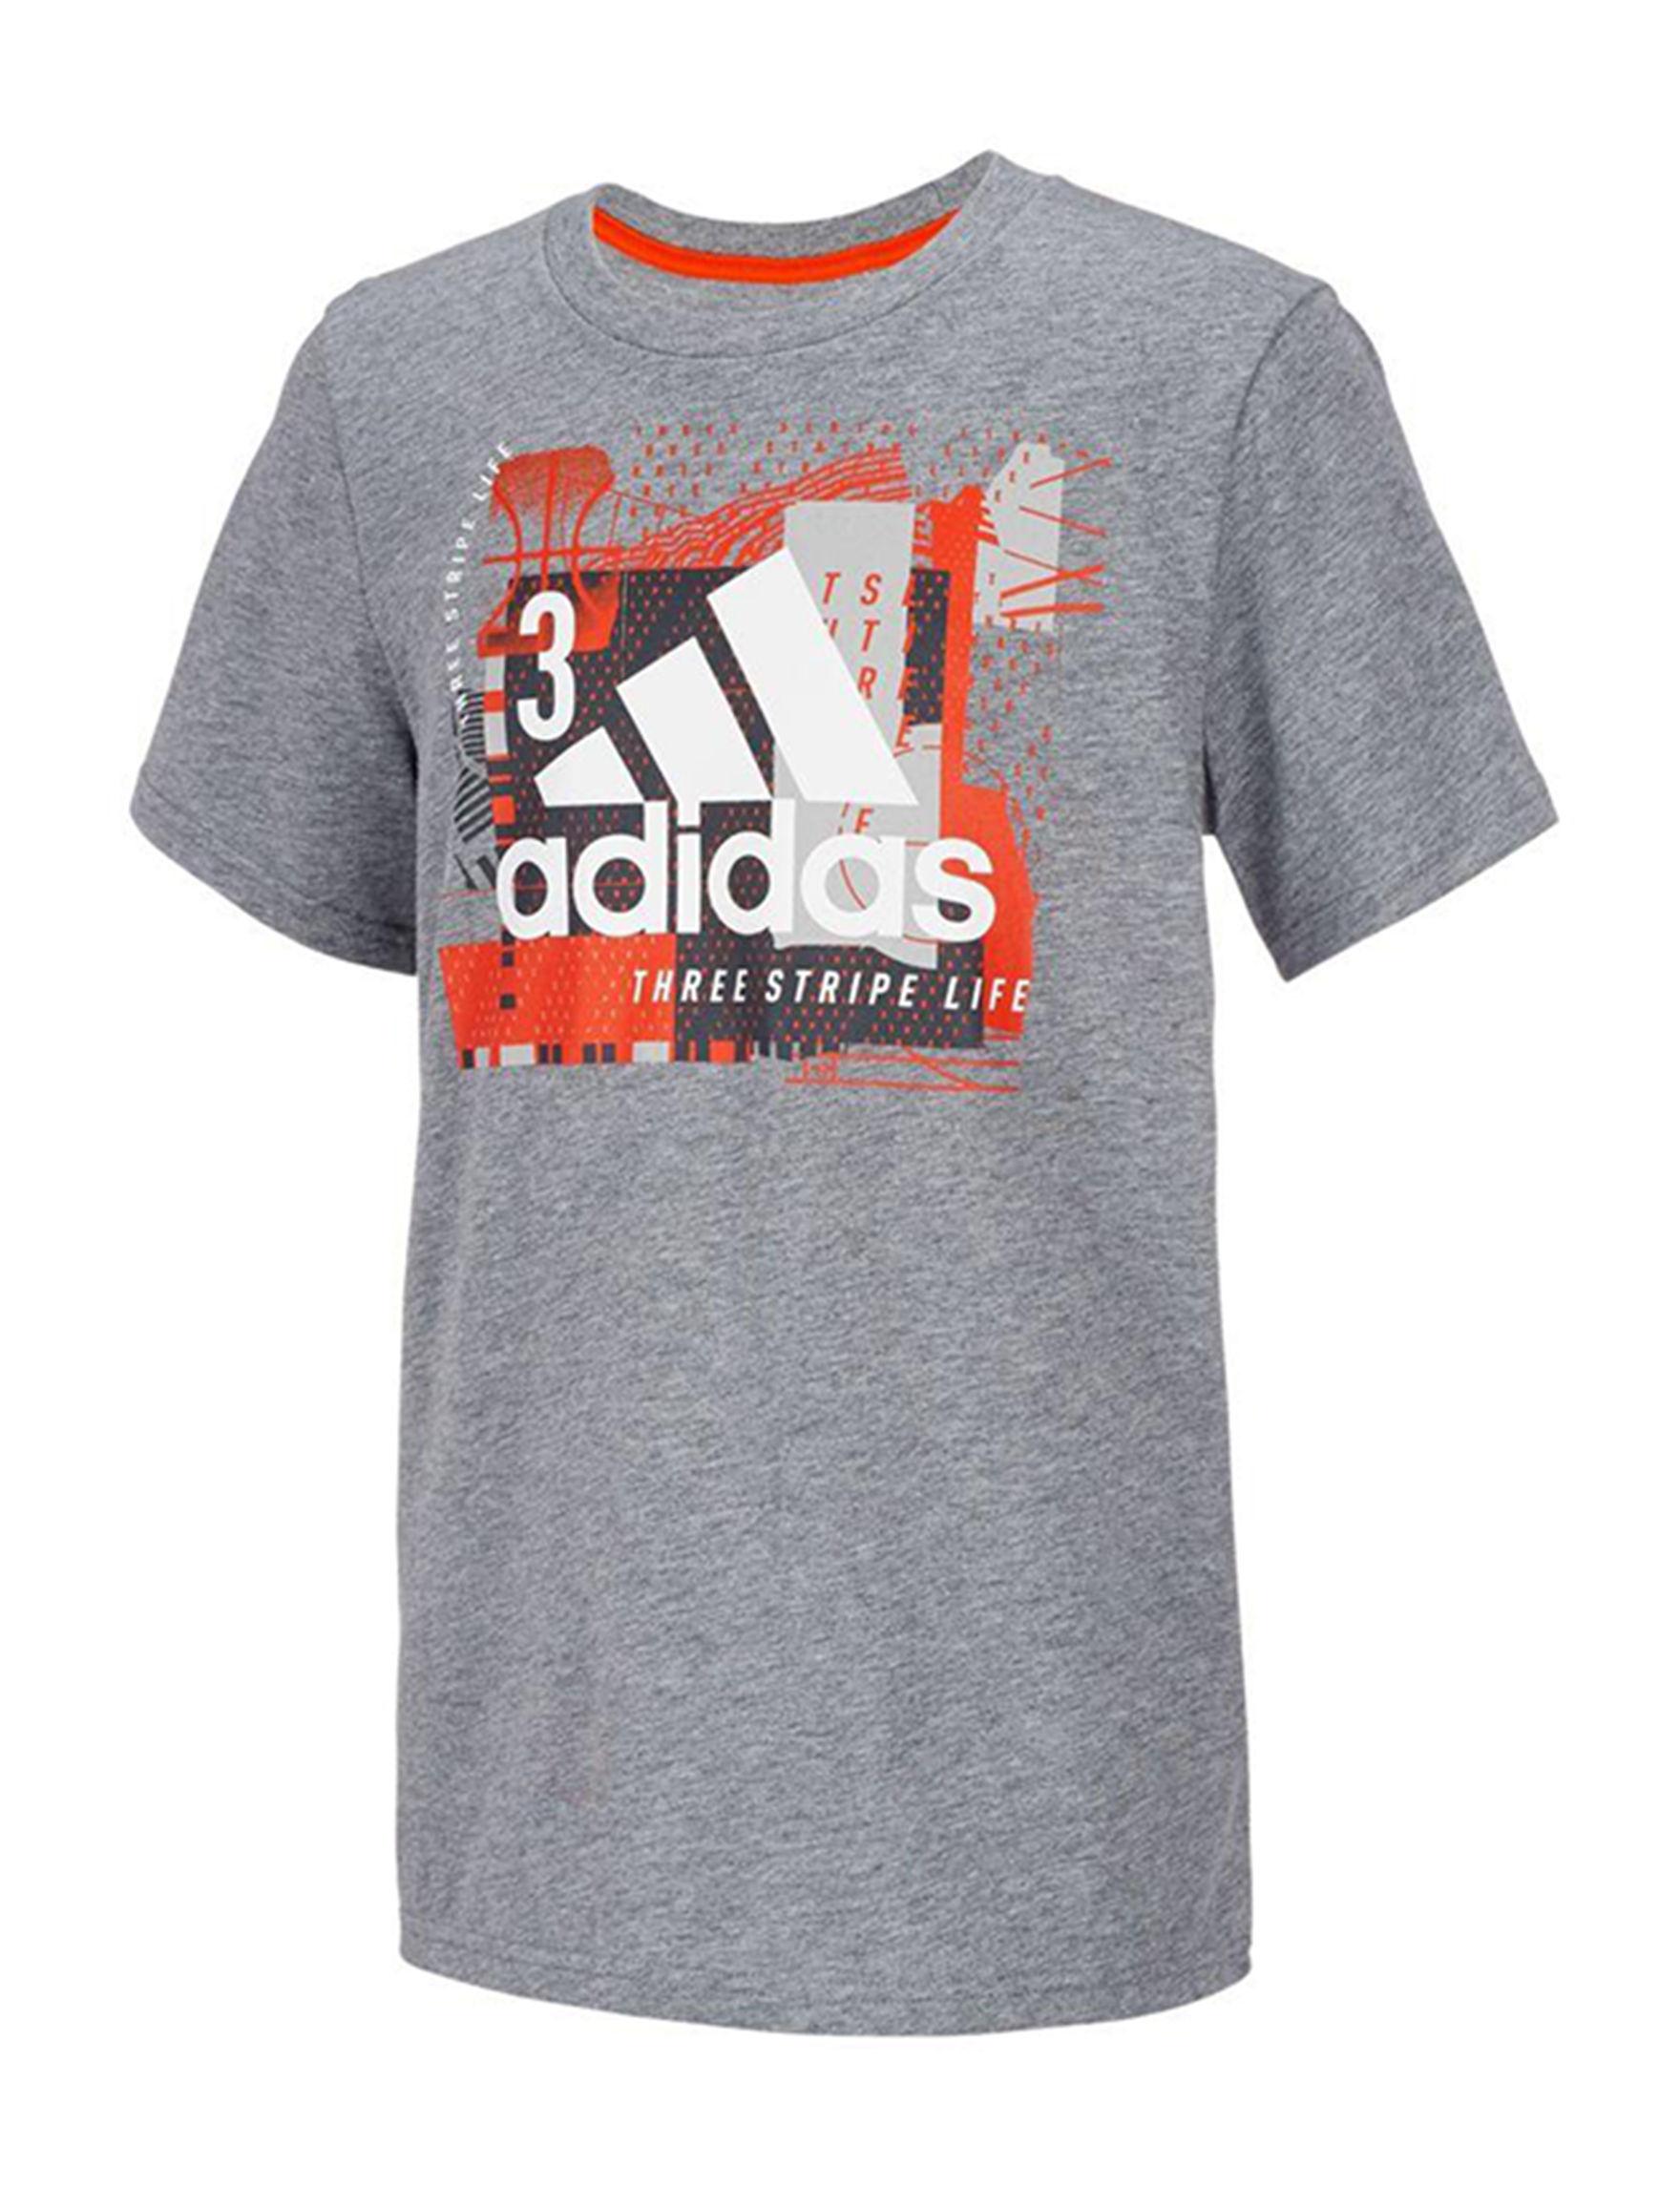 Adidas Dark Grey Tees & Tanks